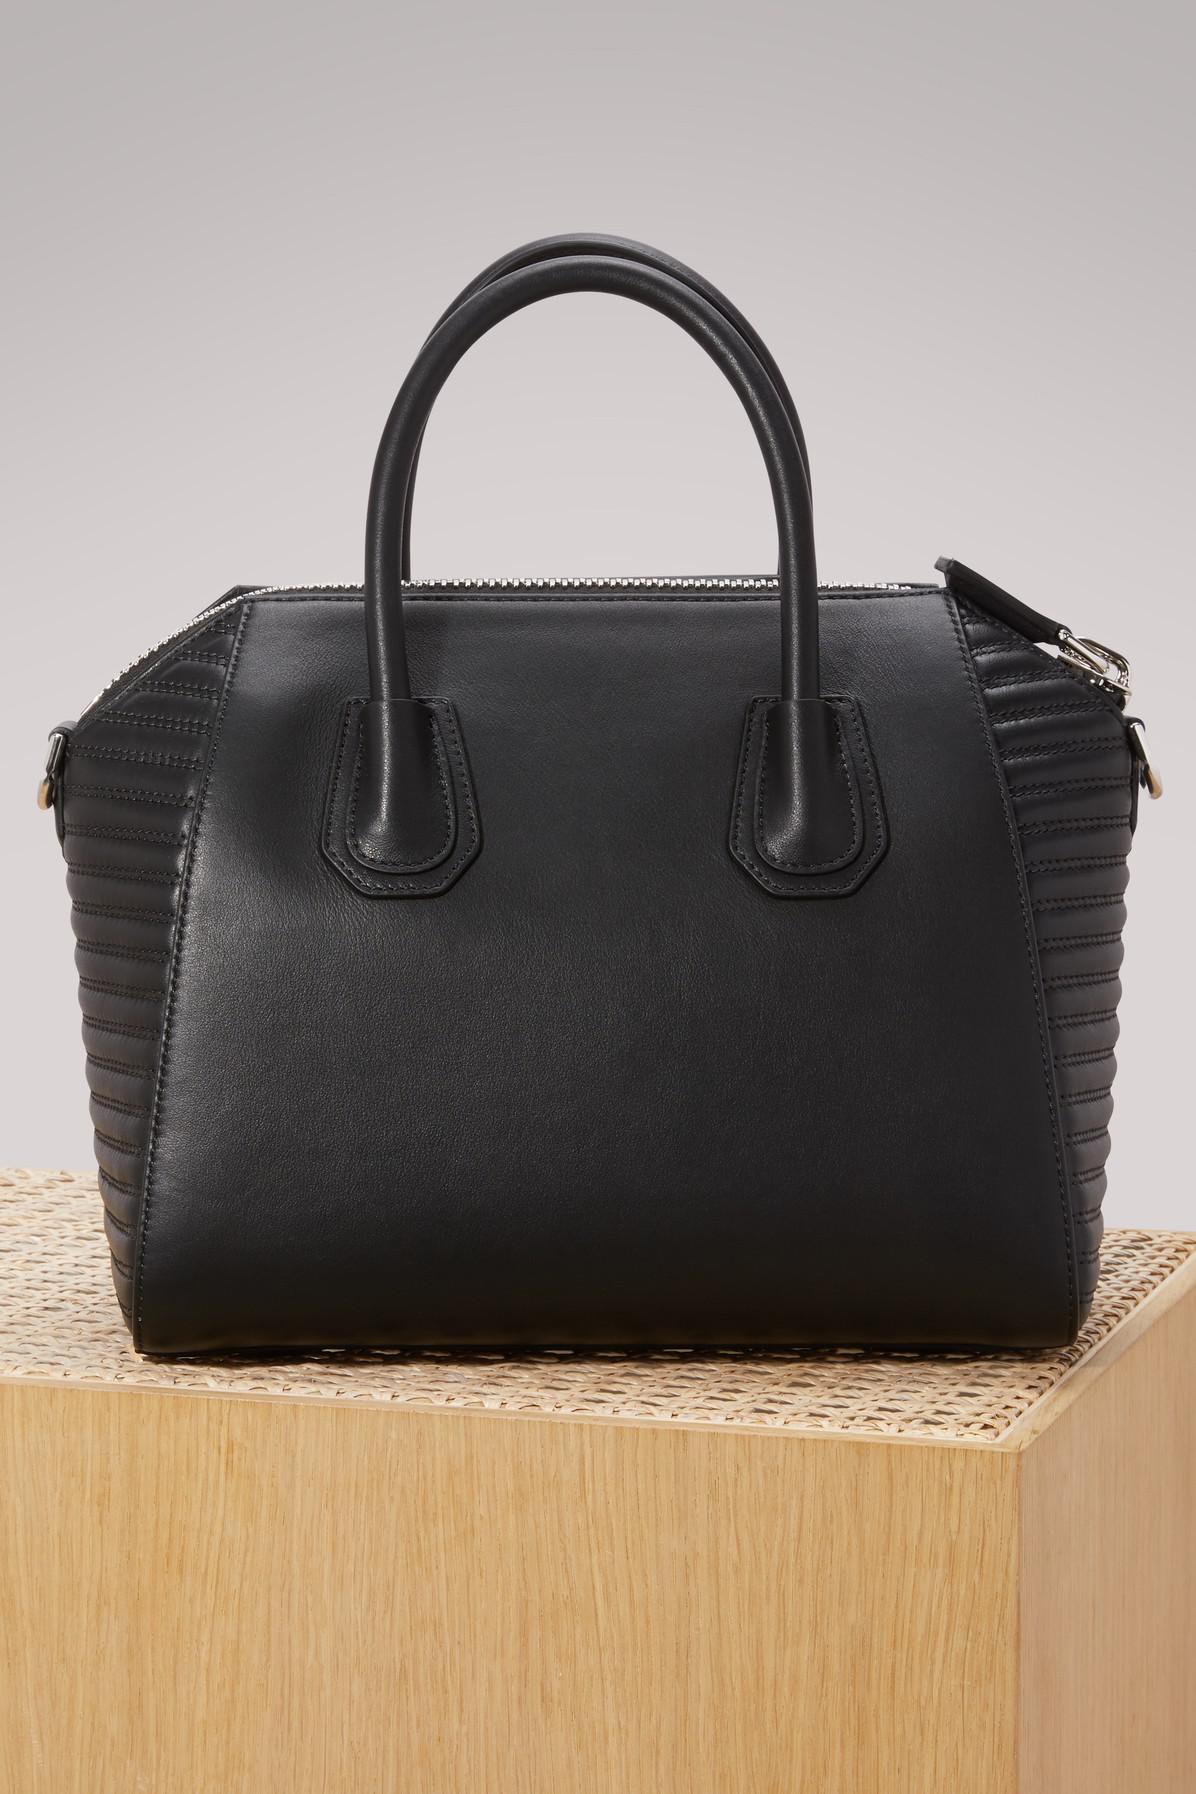 02504769f254 Lyst - Givenchy Antigona Biker Handbag in Black